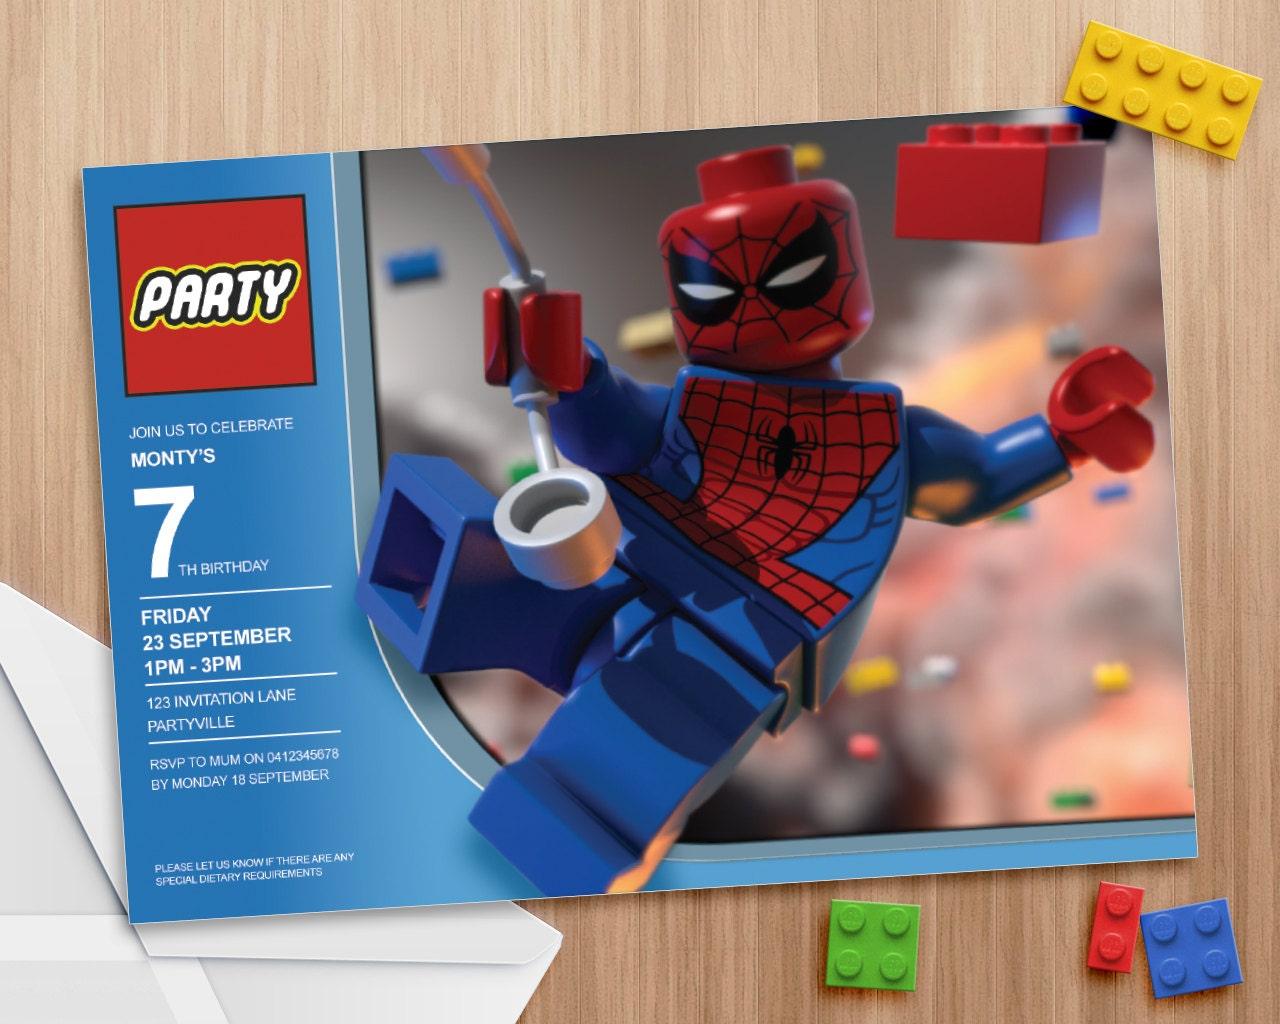 Lego Spiderman Invitation Editable and Printable print as